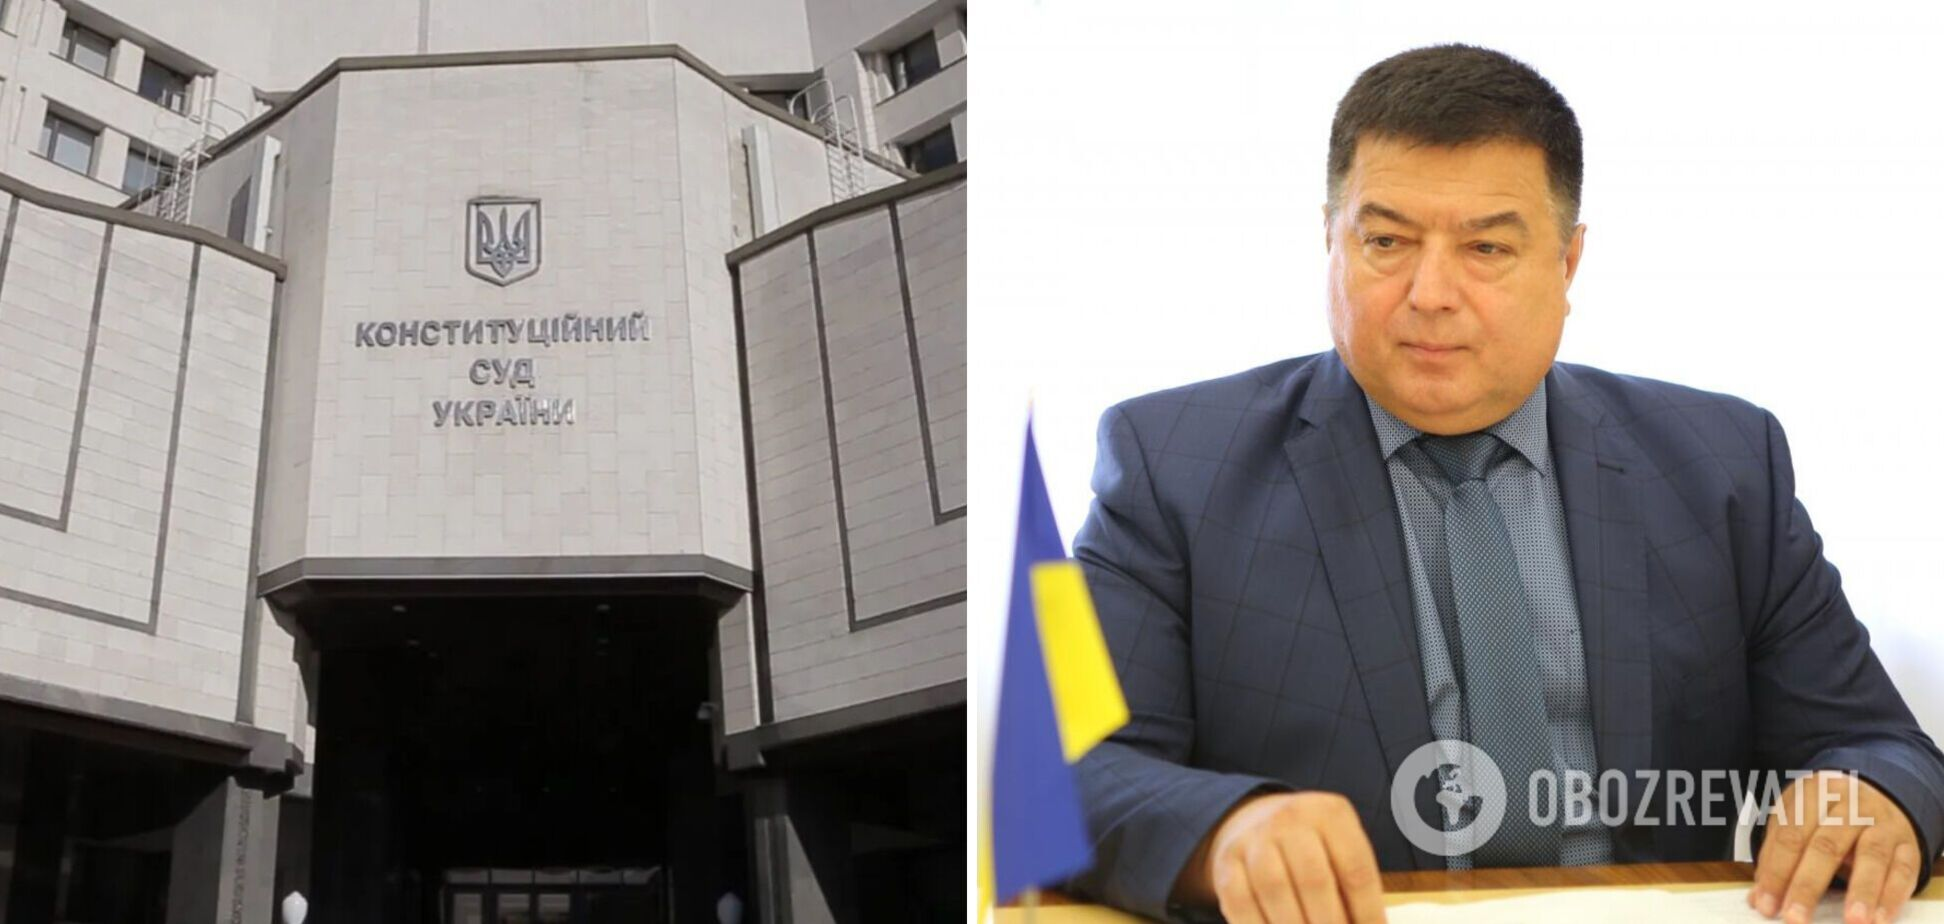 Судья КСУ АлександрТупицкий